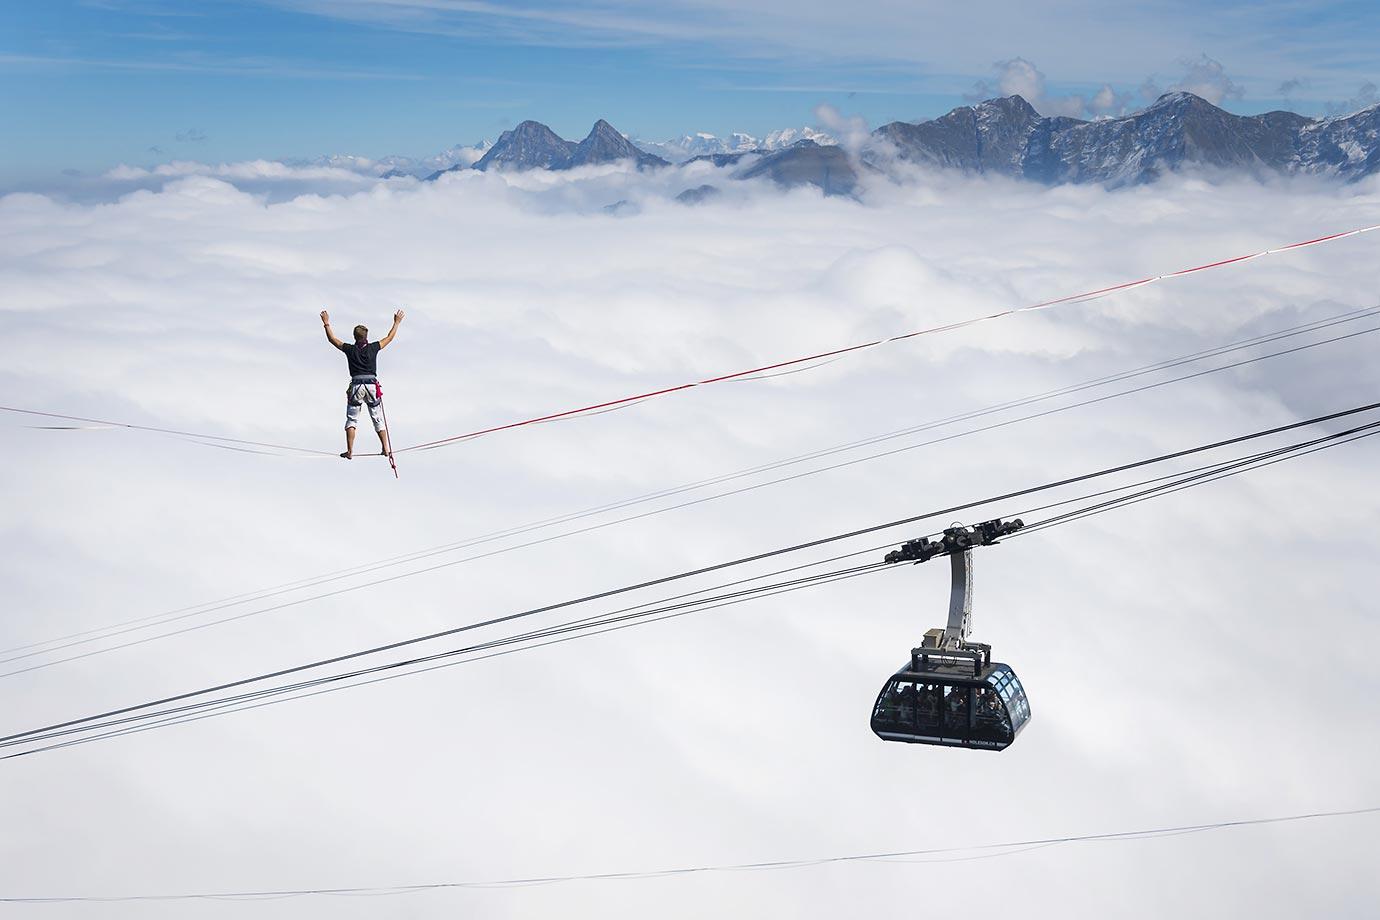 Quirin Herterich walks the line at the Highline Extreme event in western Switzerland.